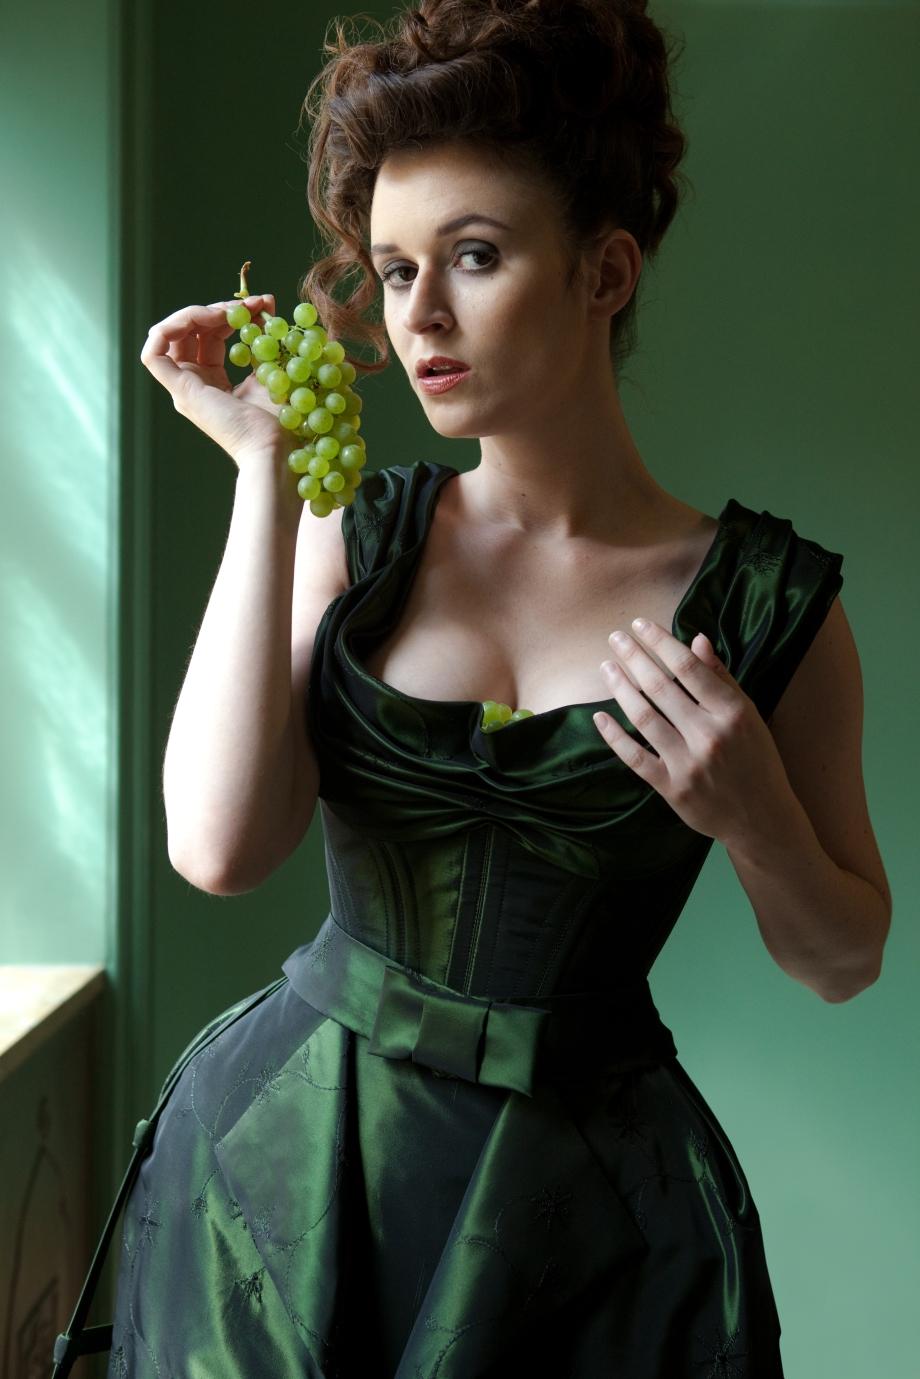 Model Anna by Stanislav Kutac 3